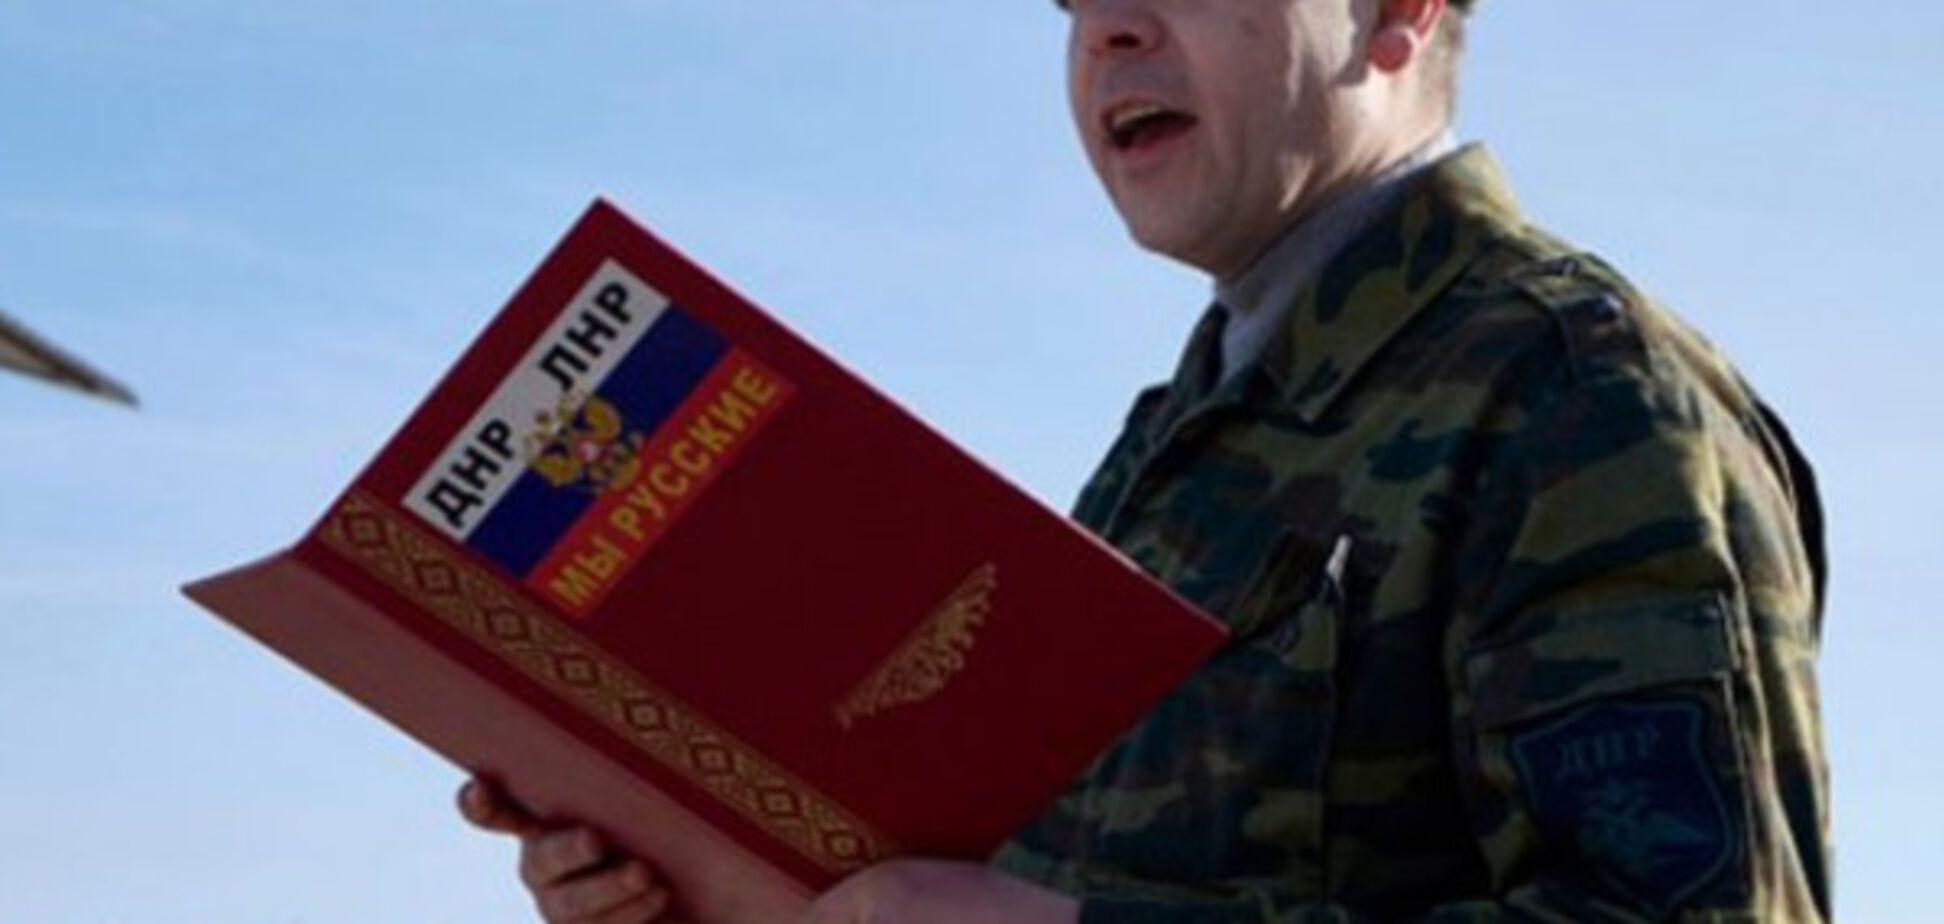 Готовится отстрел: прогнозу по захвату 'ДНР' Ростова дали объяснение